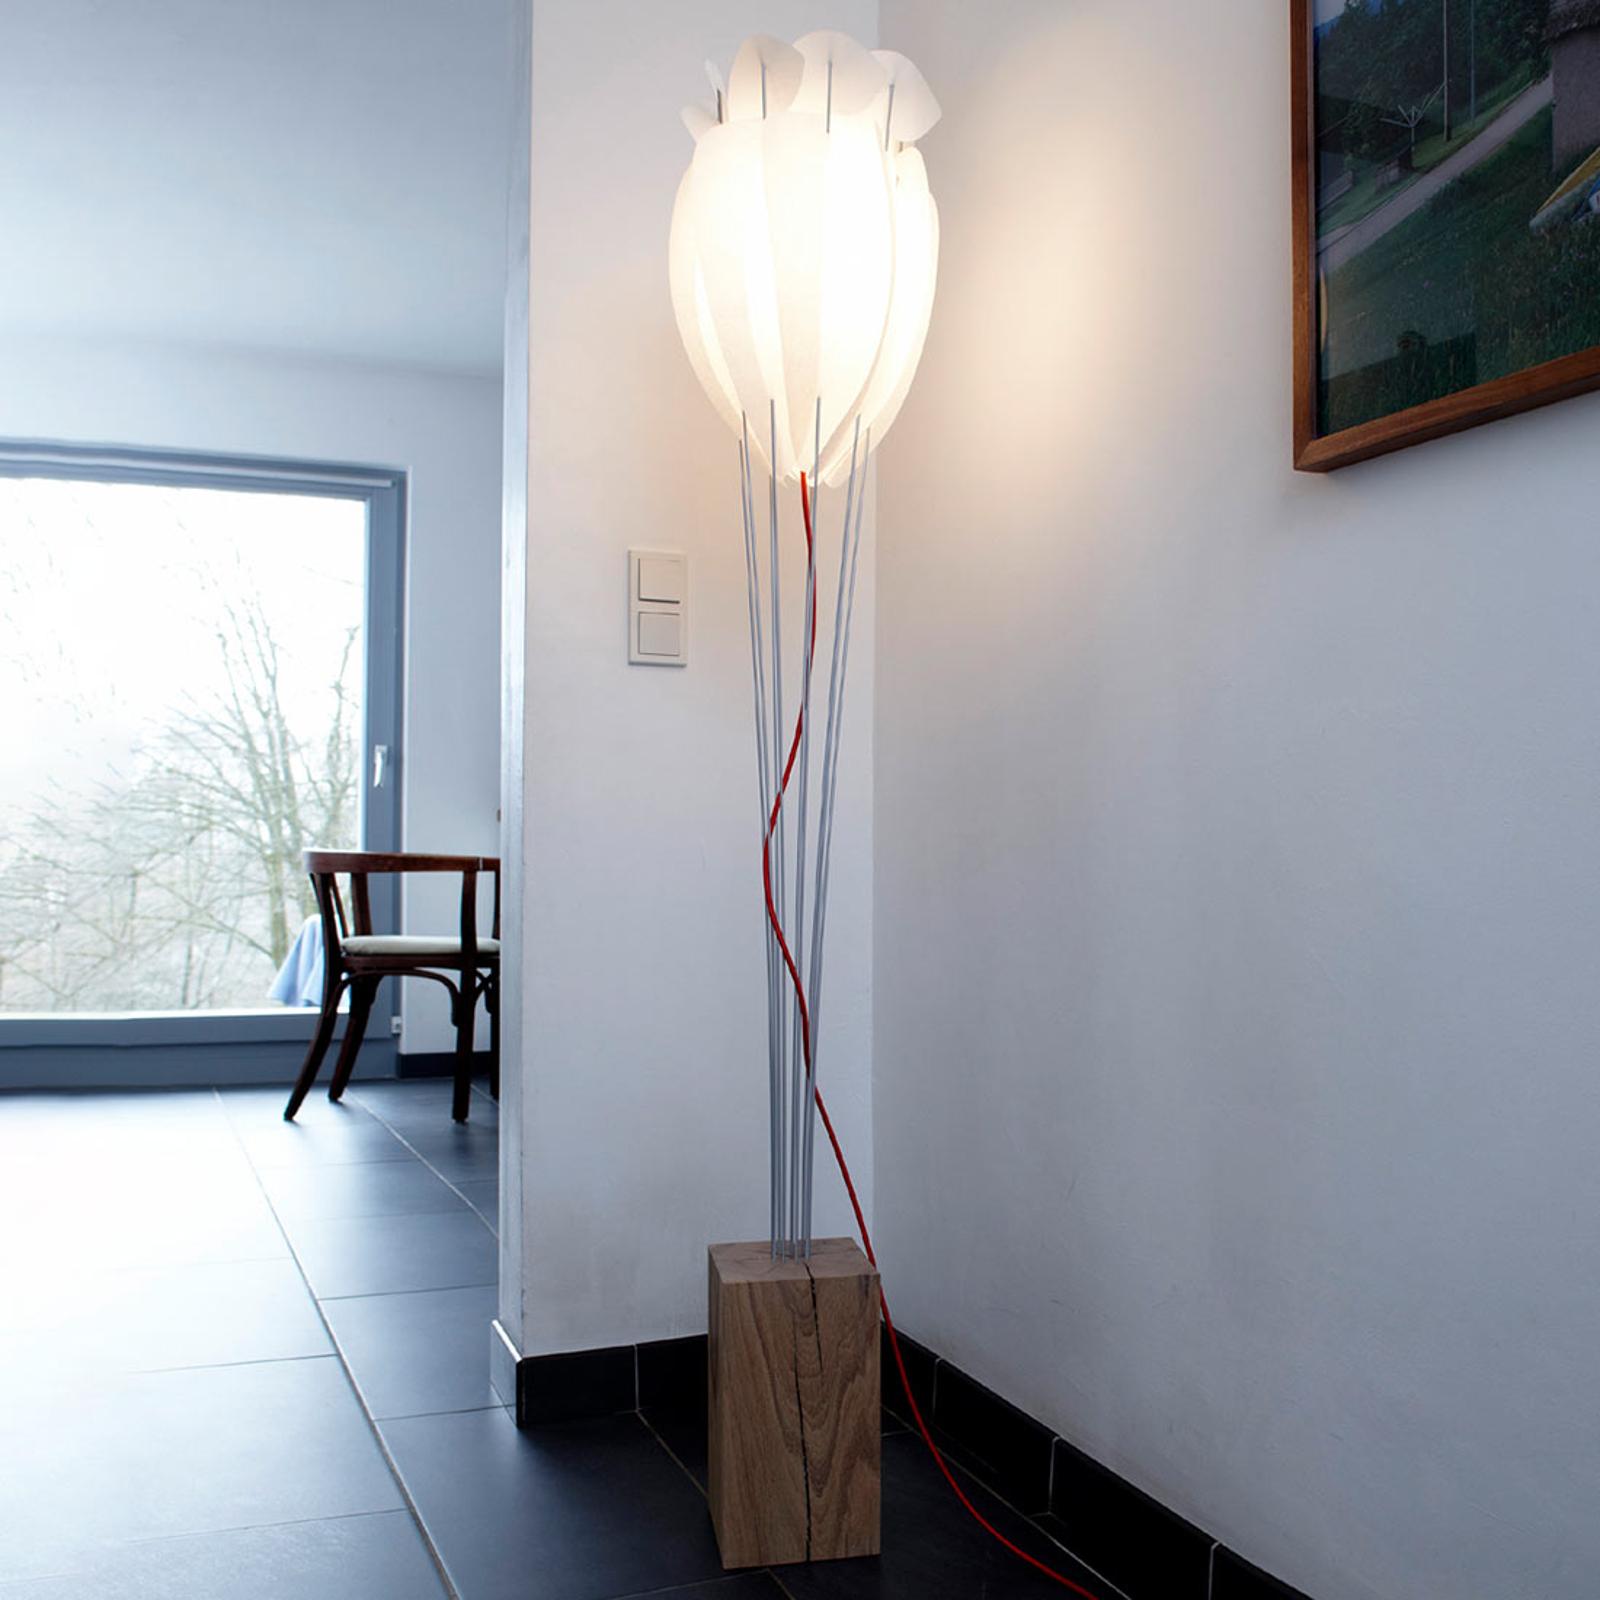 Hvit Tulip gulvlampe i eik og med rød kabel